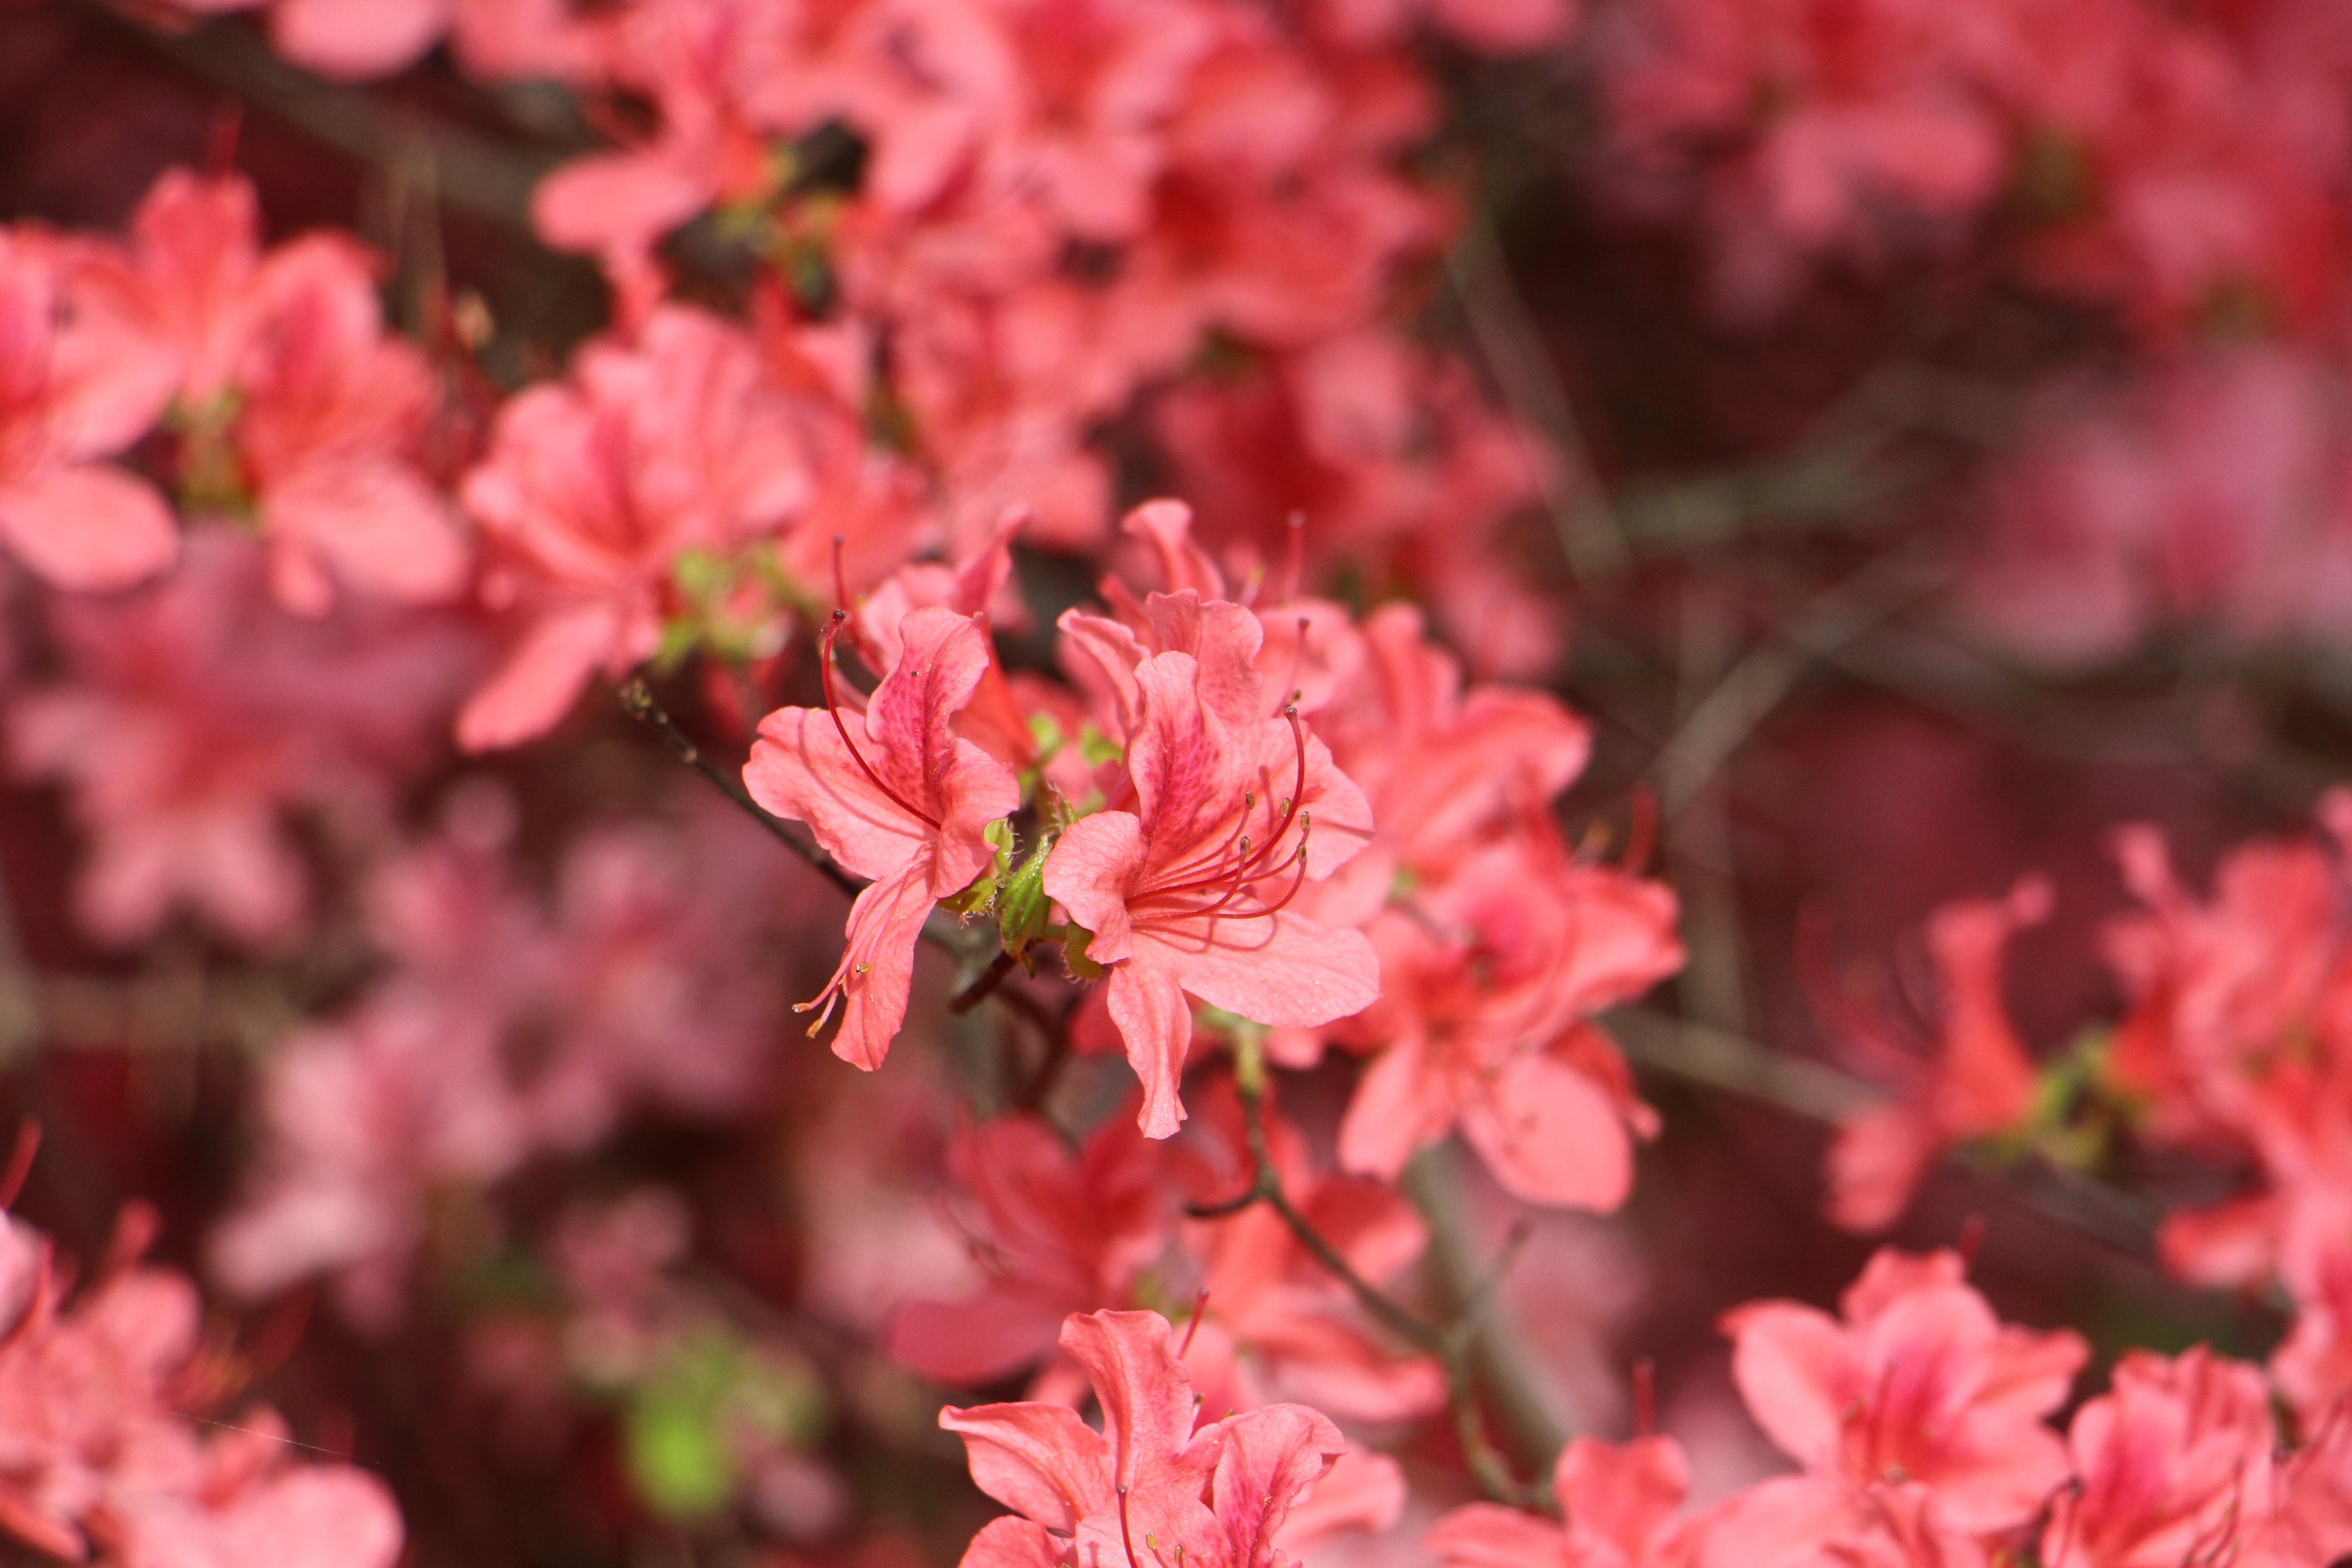 Free Images : tree, nature, blossom, leaf, flower, petal, bloom, red ...